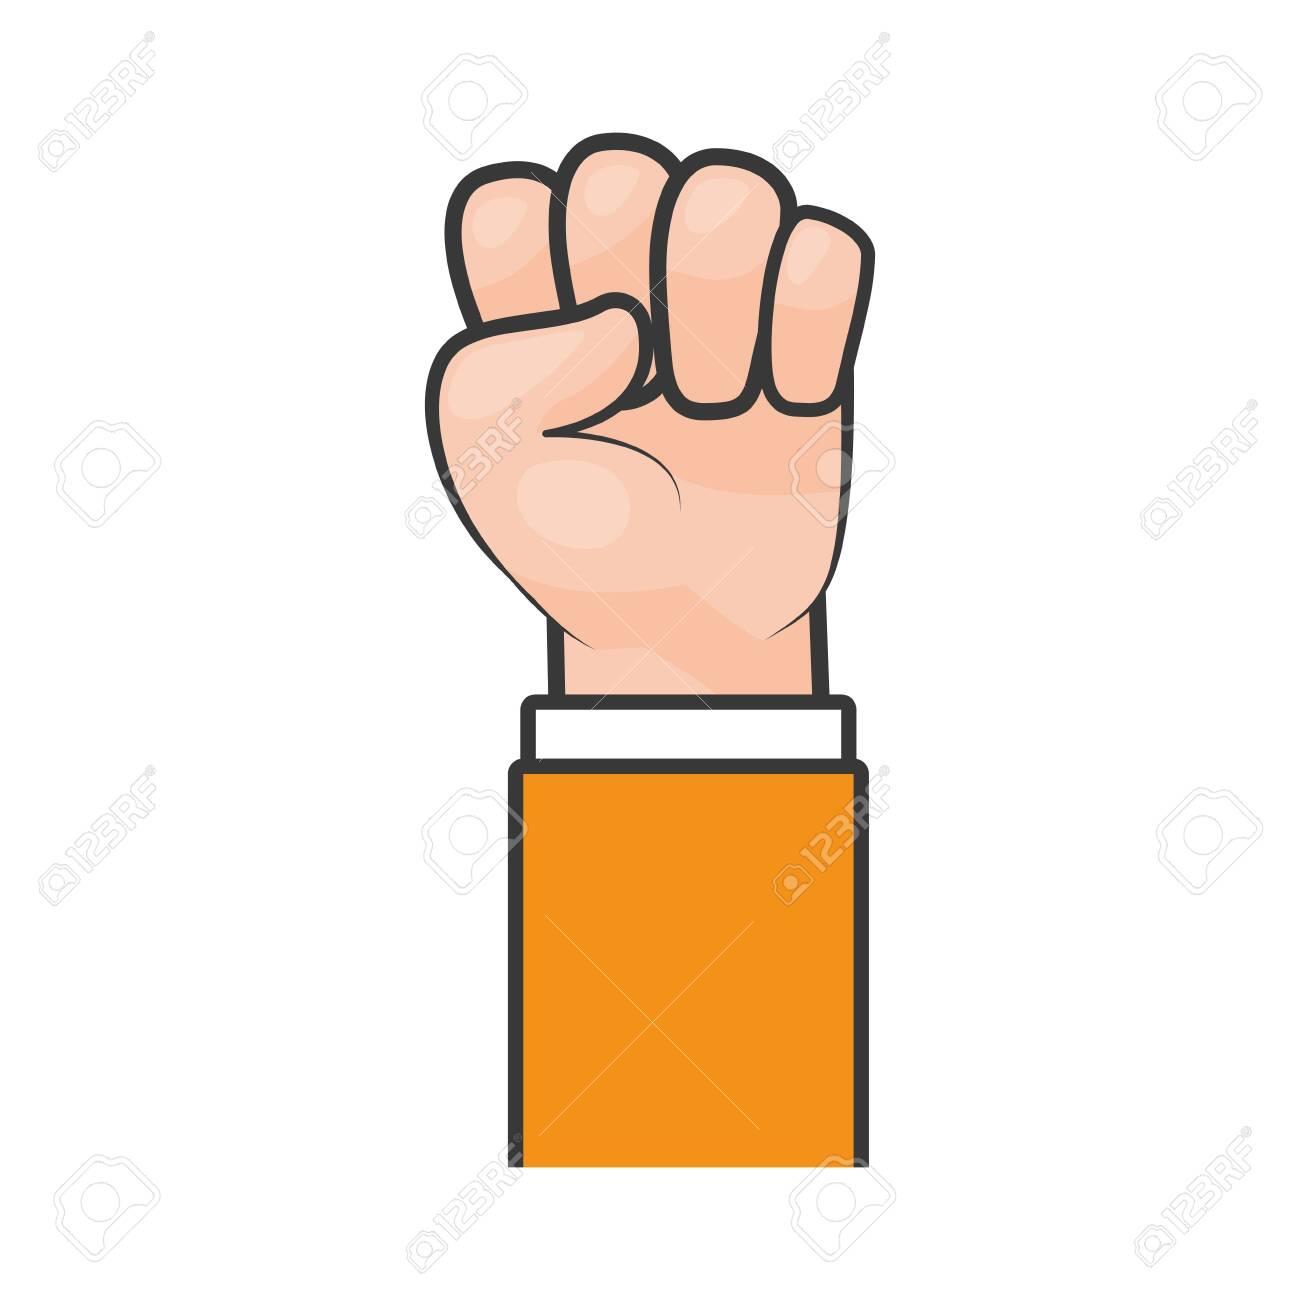 happy labour day hand raised fist vector illustration - 124268422